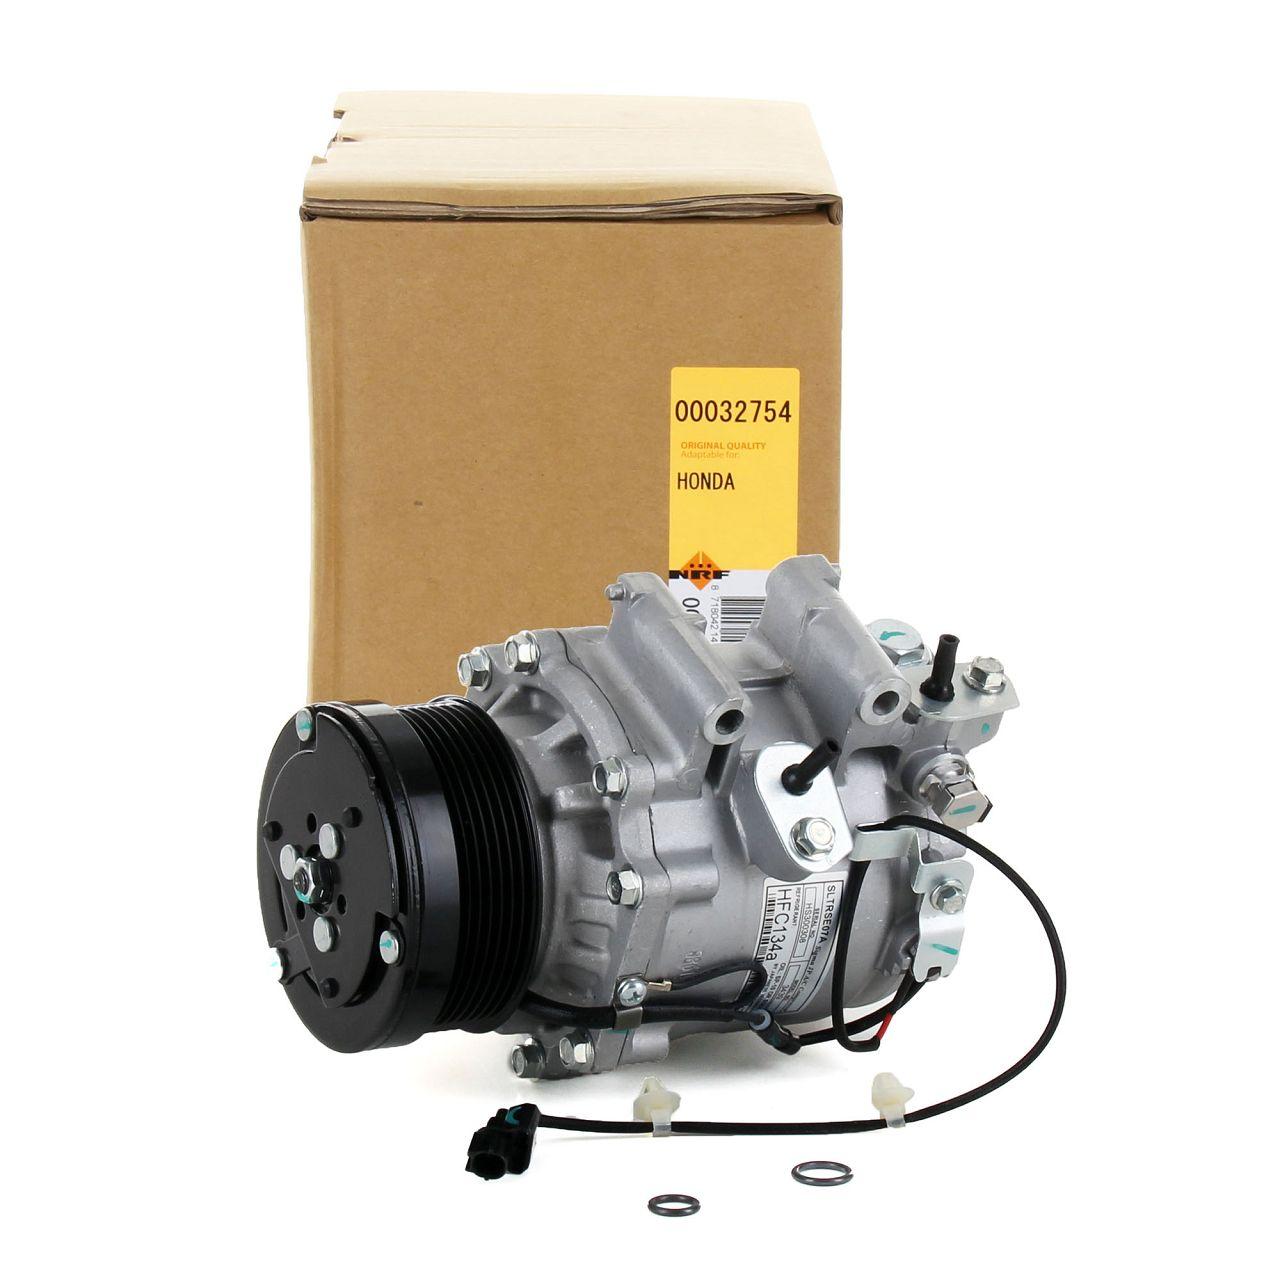 NRF 32754 Kompressor Klimaanlage EASY FIT für HONDA CIVIC VIII + FR-V (BE) 1.8